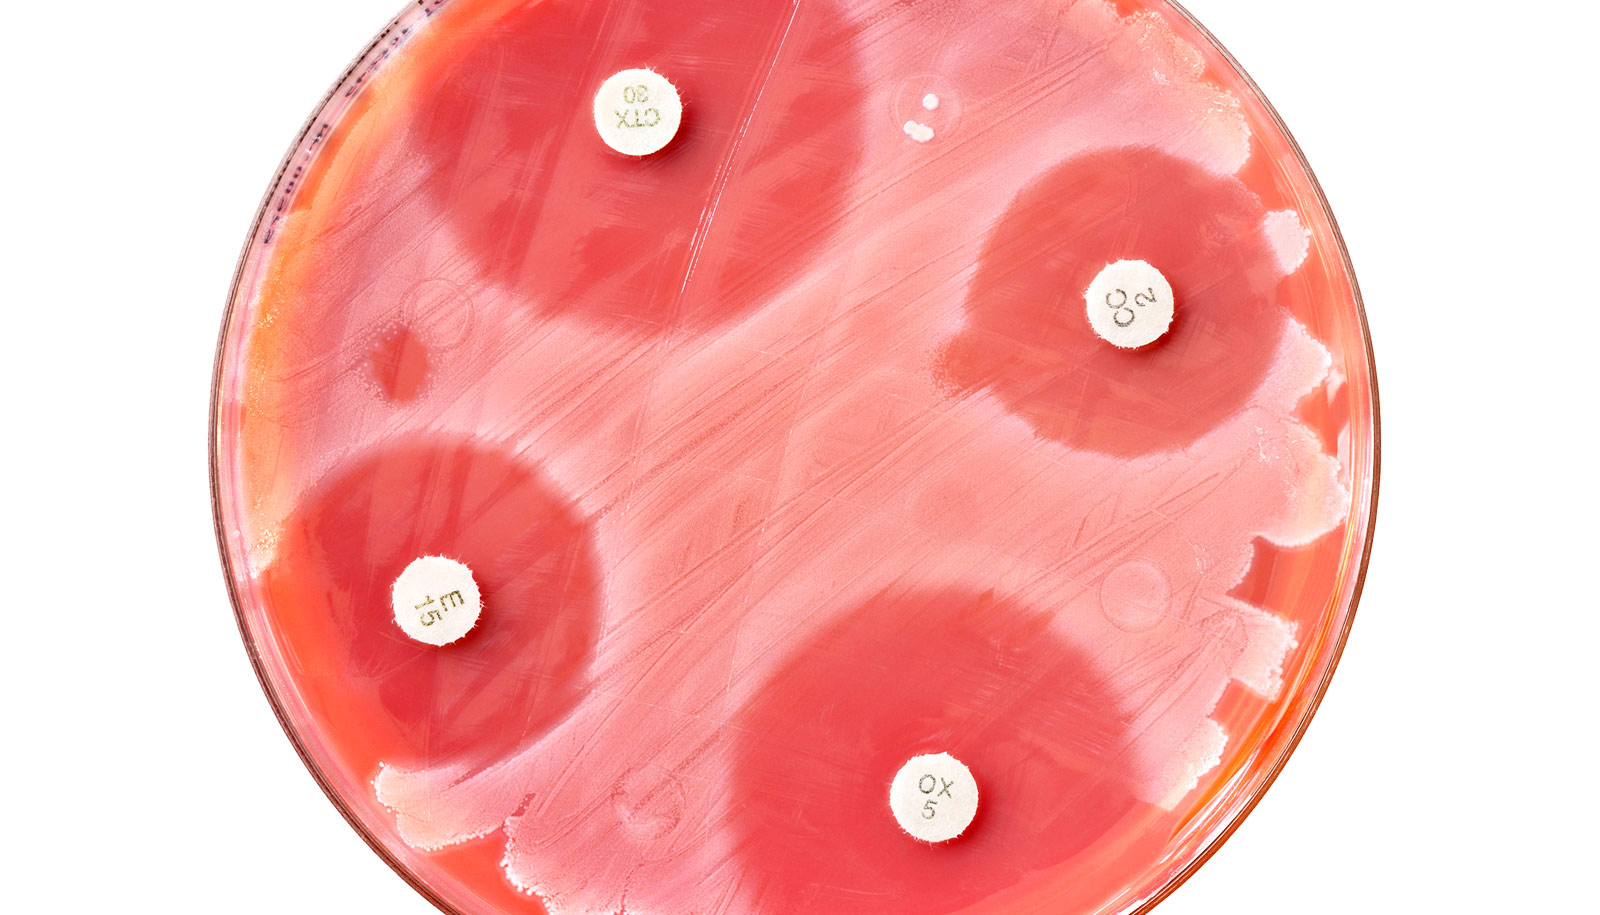 Antibiotics can goad 'superbugs' into ganging up on us